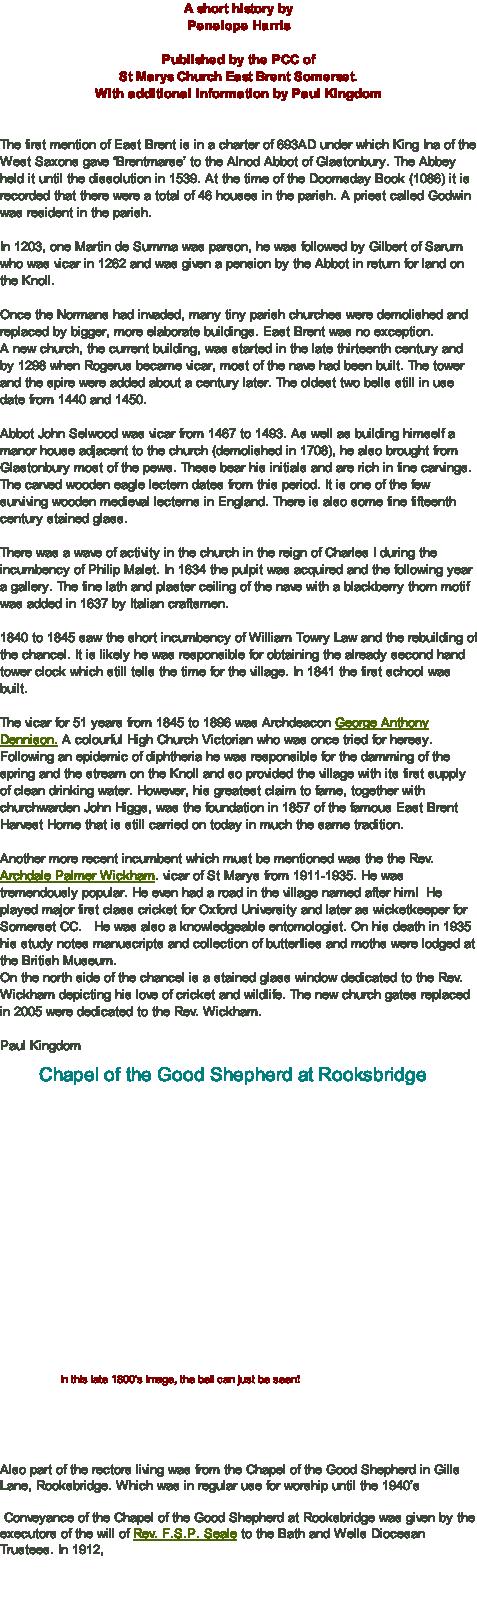 GolfTEC Arboretum - 14 Reviews - Golf - 10001 Research